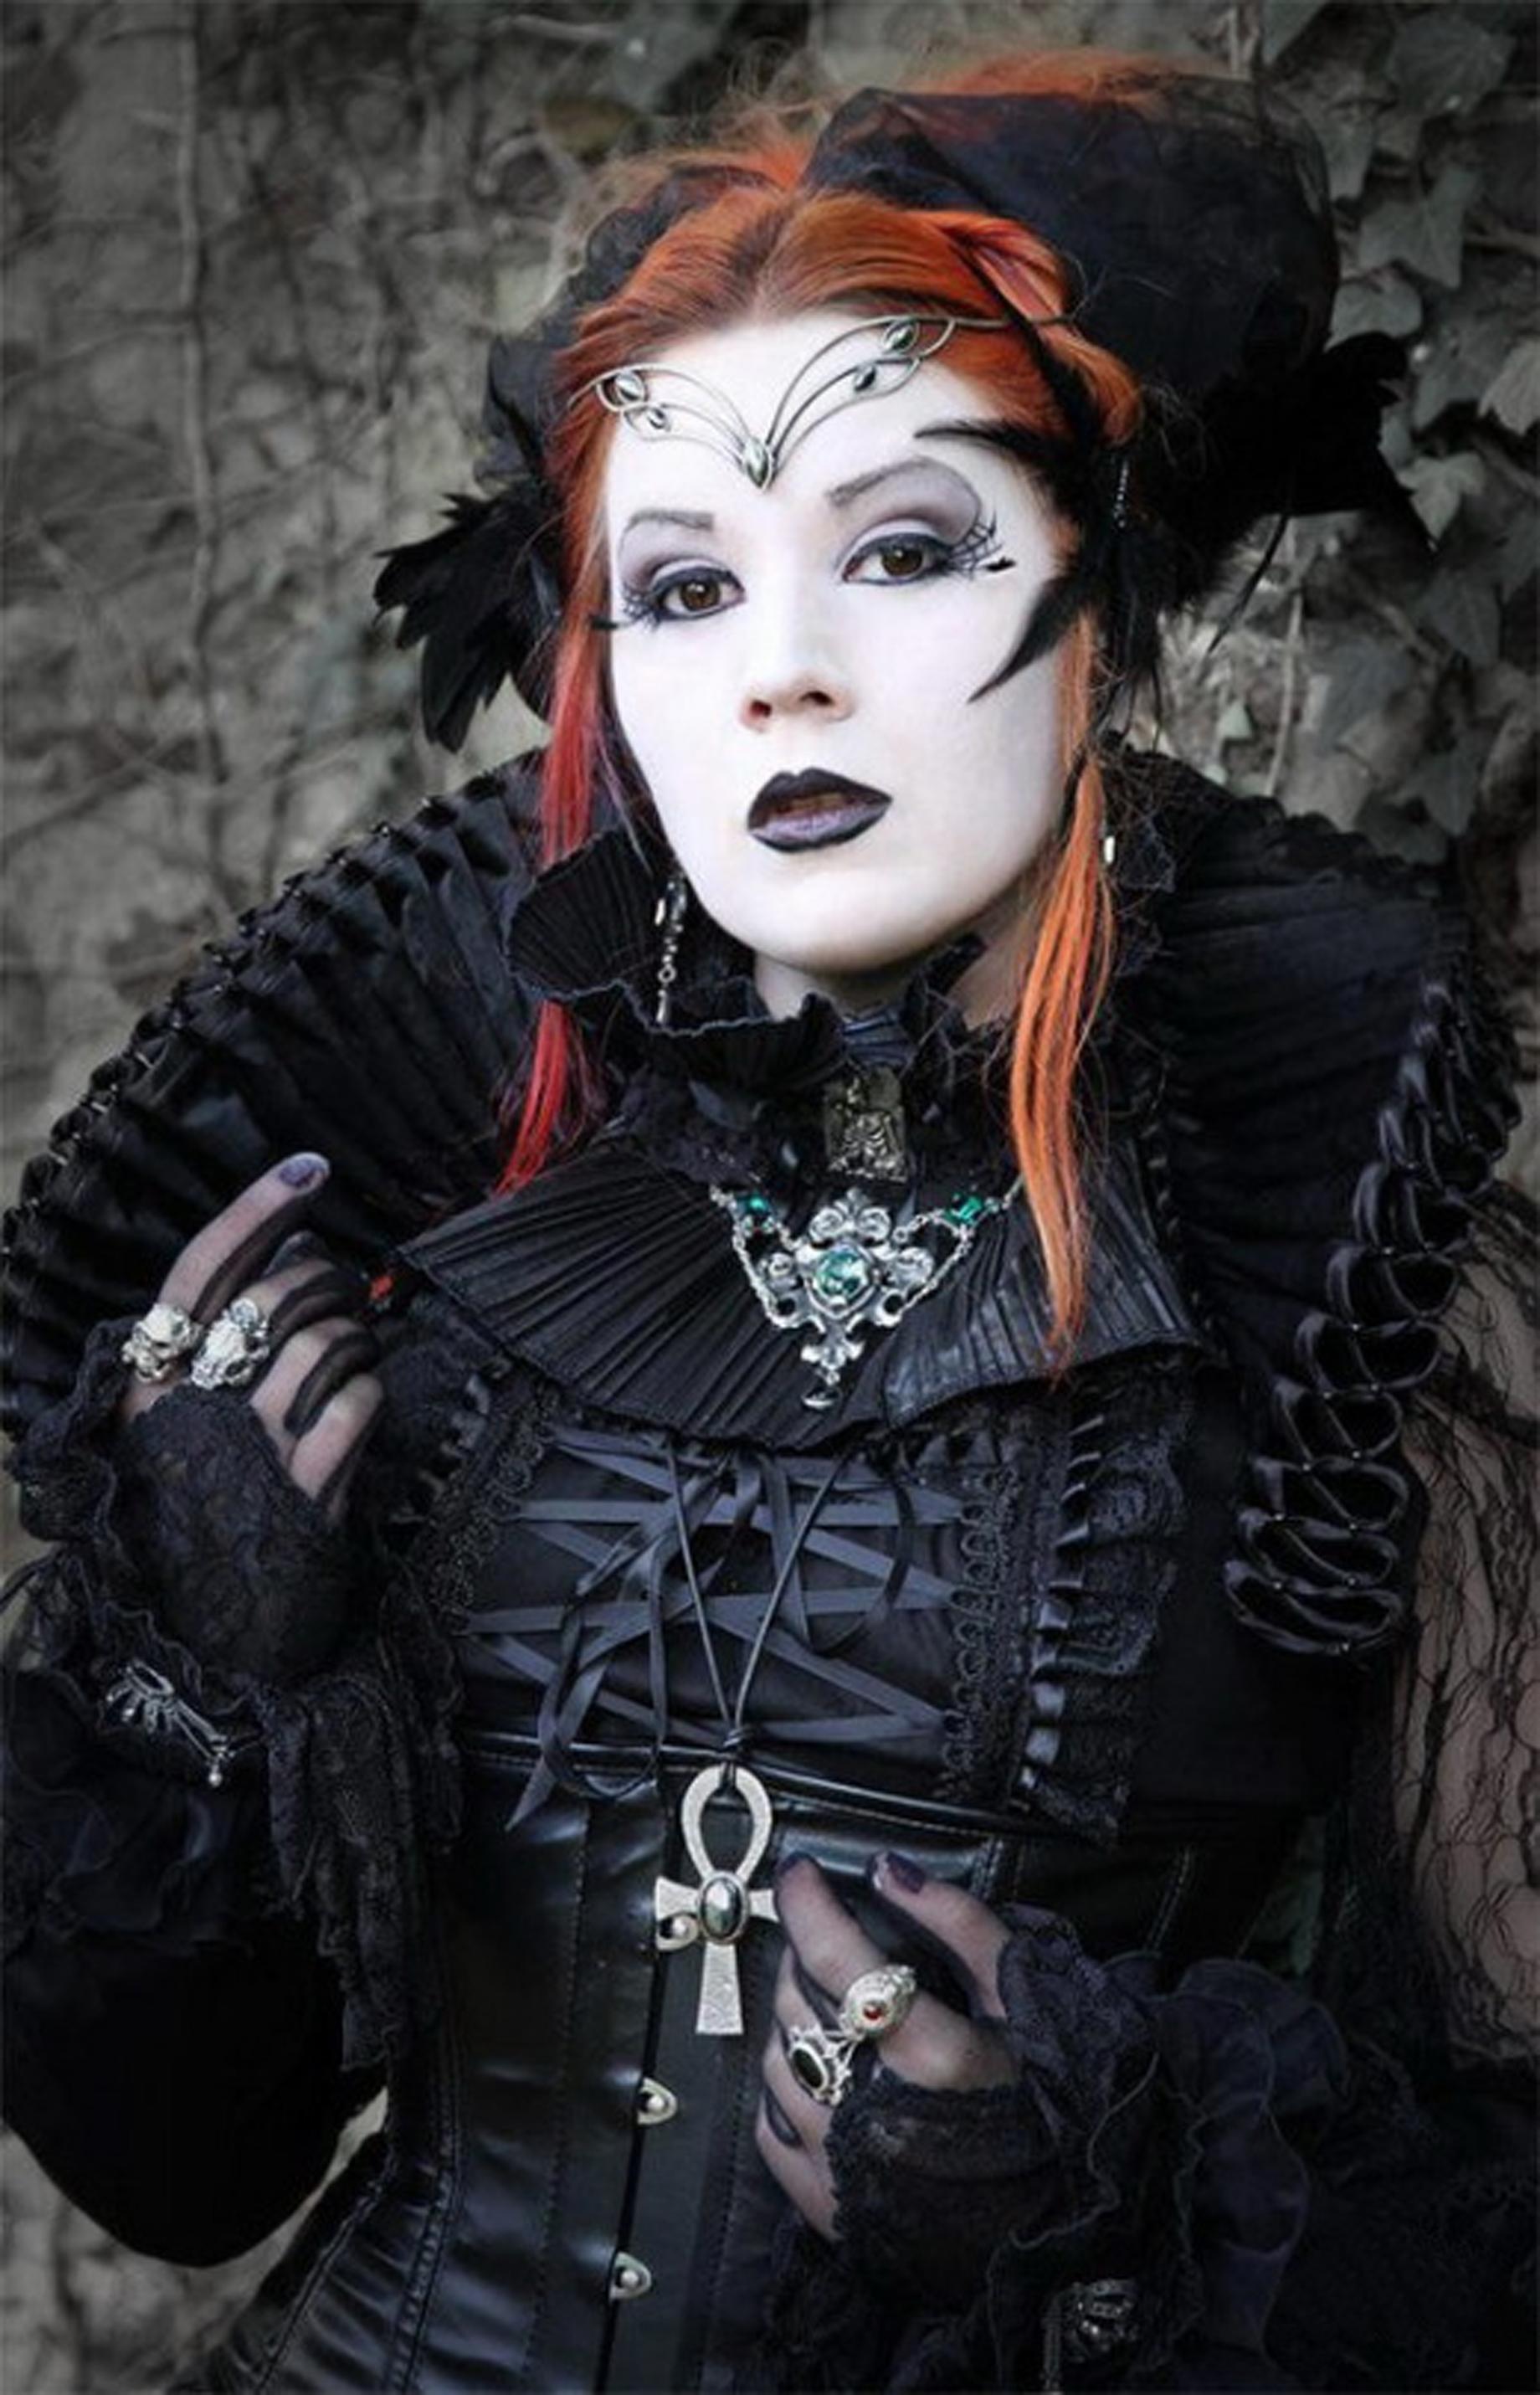 Hentai Vampire Girl inside vampire girl | faustus crow